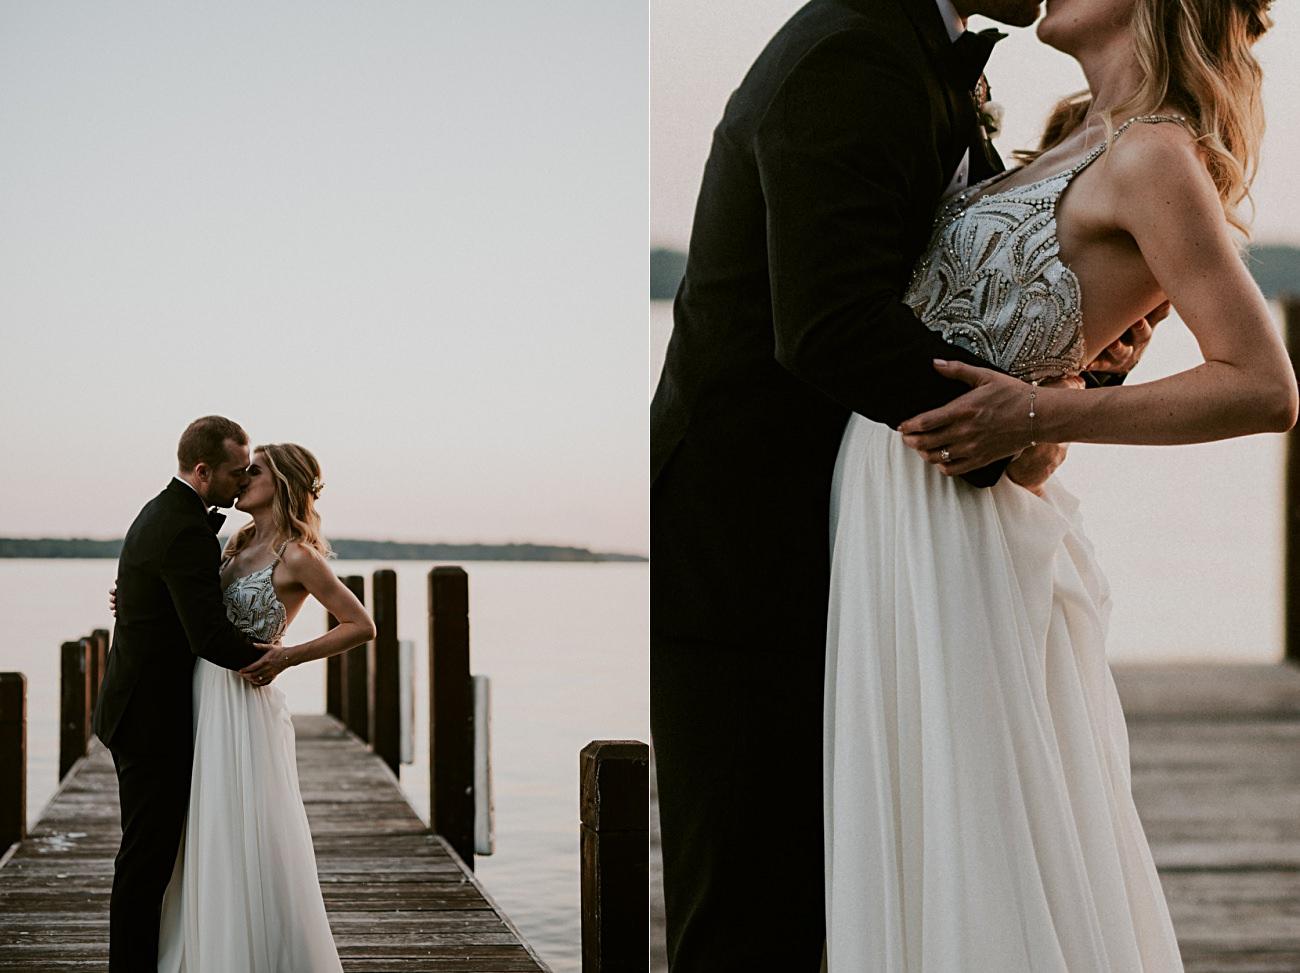 Lakeside bride and groom photos, sunset photos, Elegant Ballroom Wedding, Gold & Blush Wedding, Lakeside wedding in Green Lake Wisconsin -Heidel House Wedding - Green Lake Wisconsin Wedding